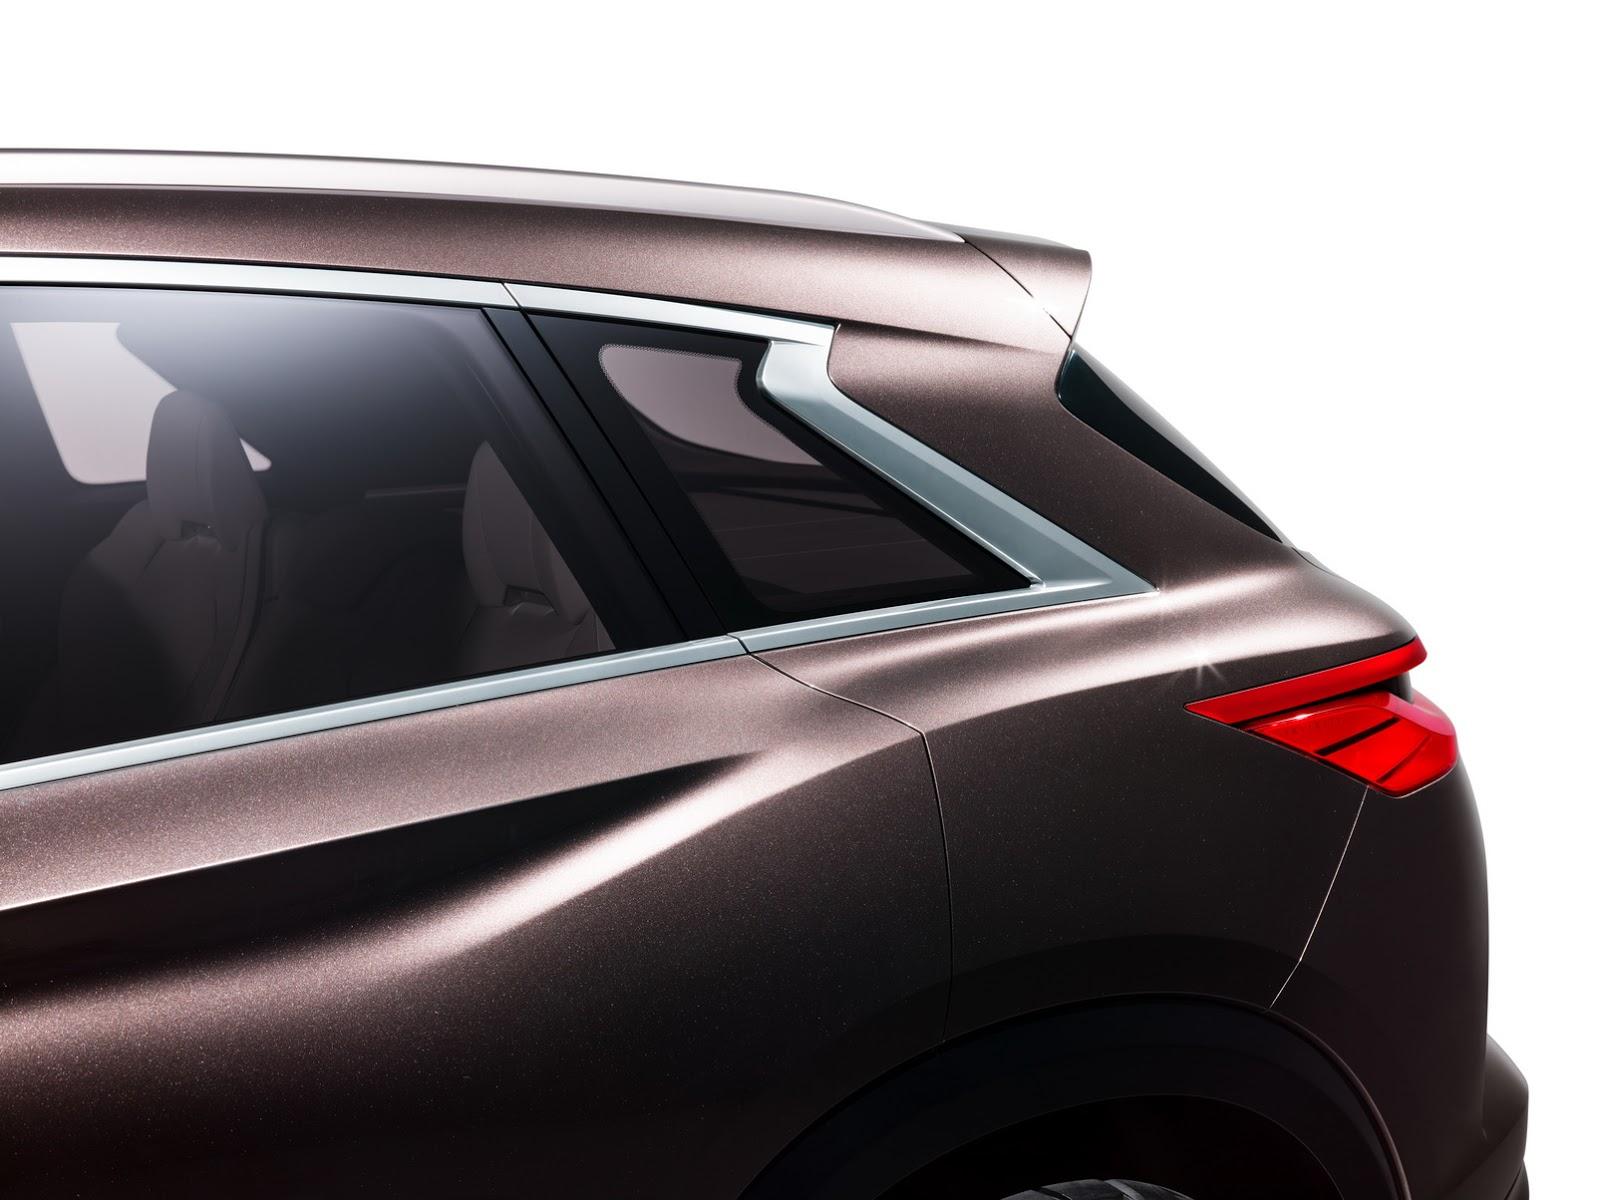 إنفينيتي تعلن عن QX50 كونسيبت بمعرض ديترويت Infinity Infiniti-qx50-concept-arrives-detroit-20